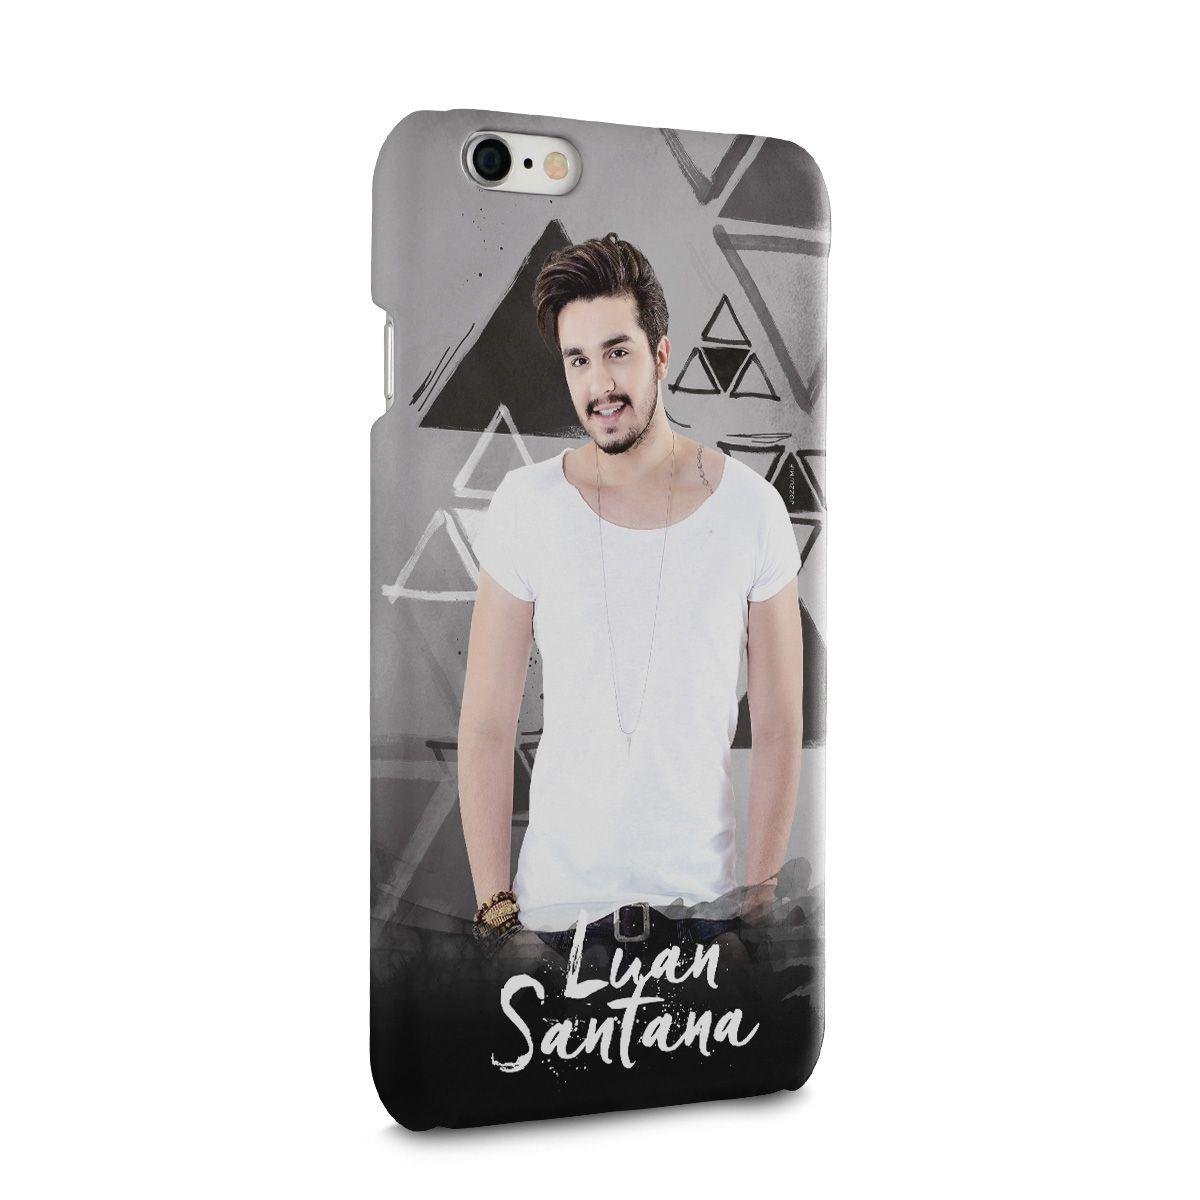 Capa para iPhone 6/6S Luan Santana Picture